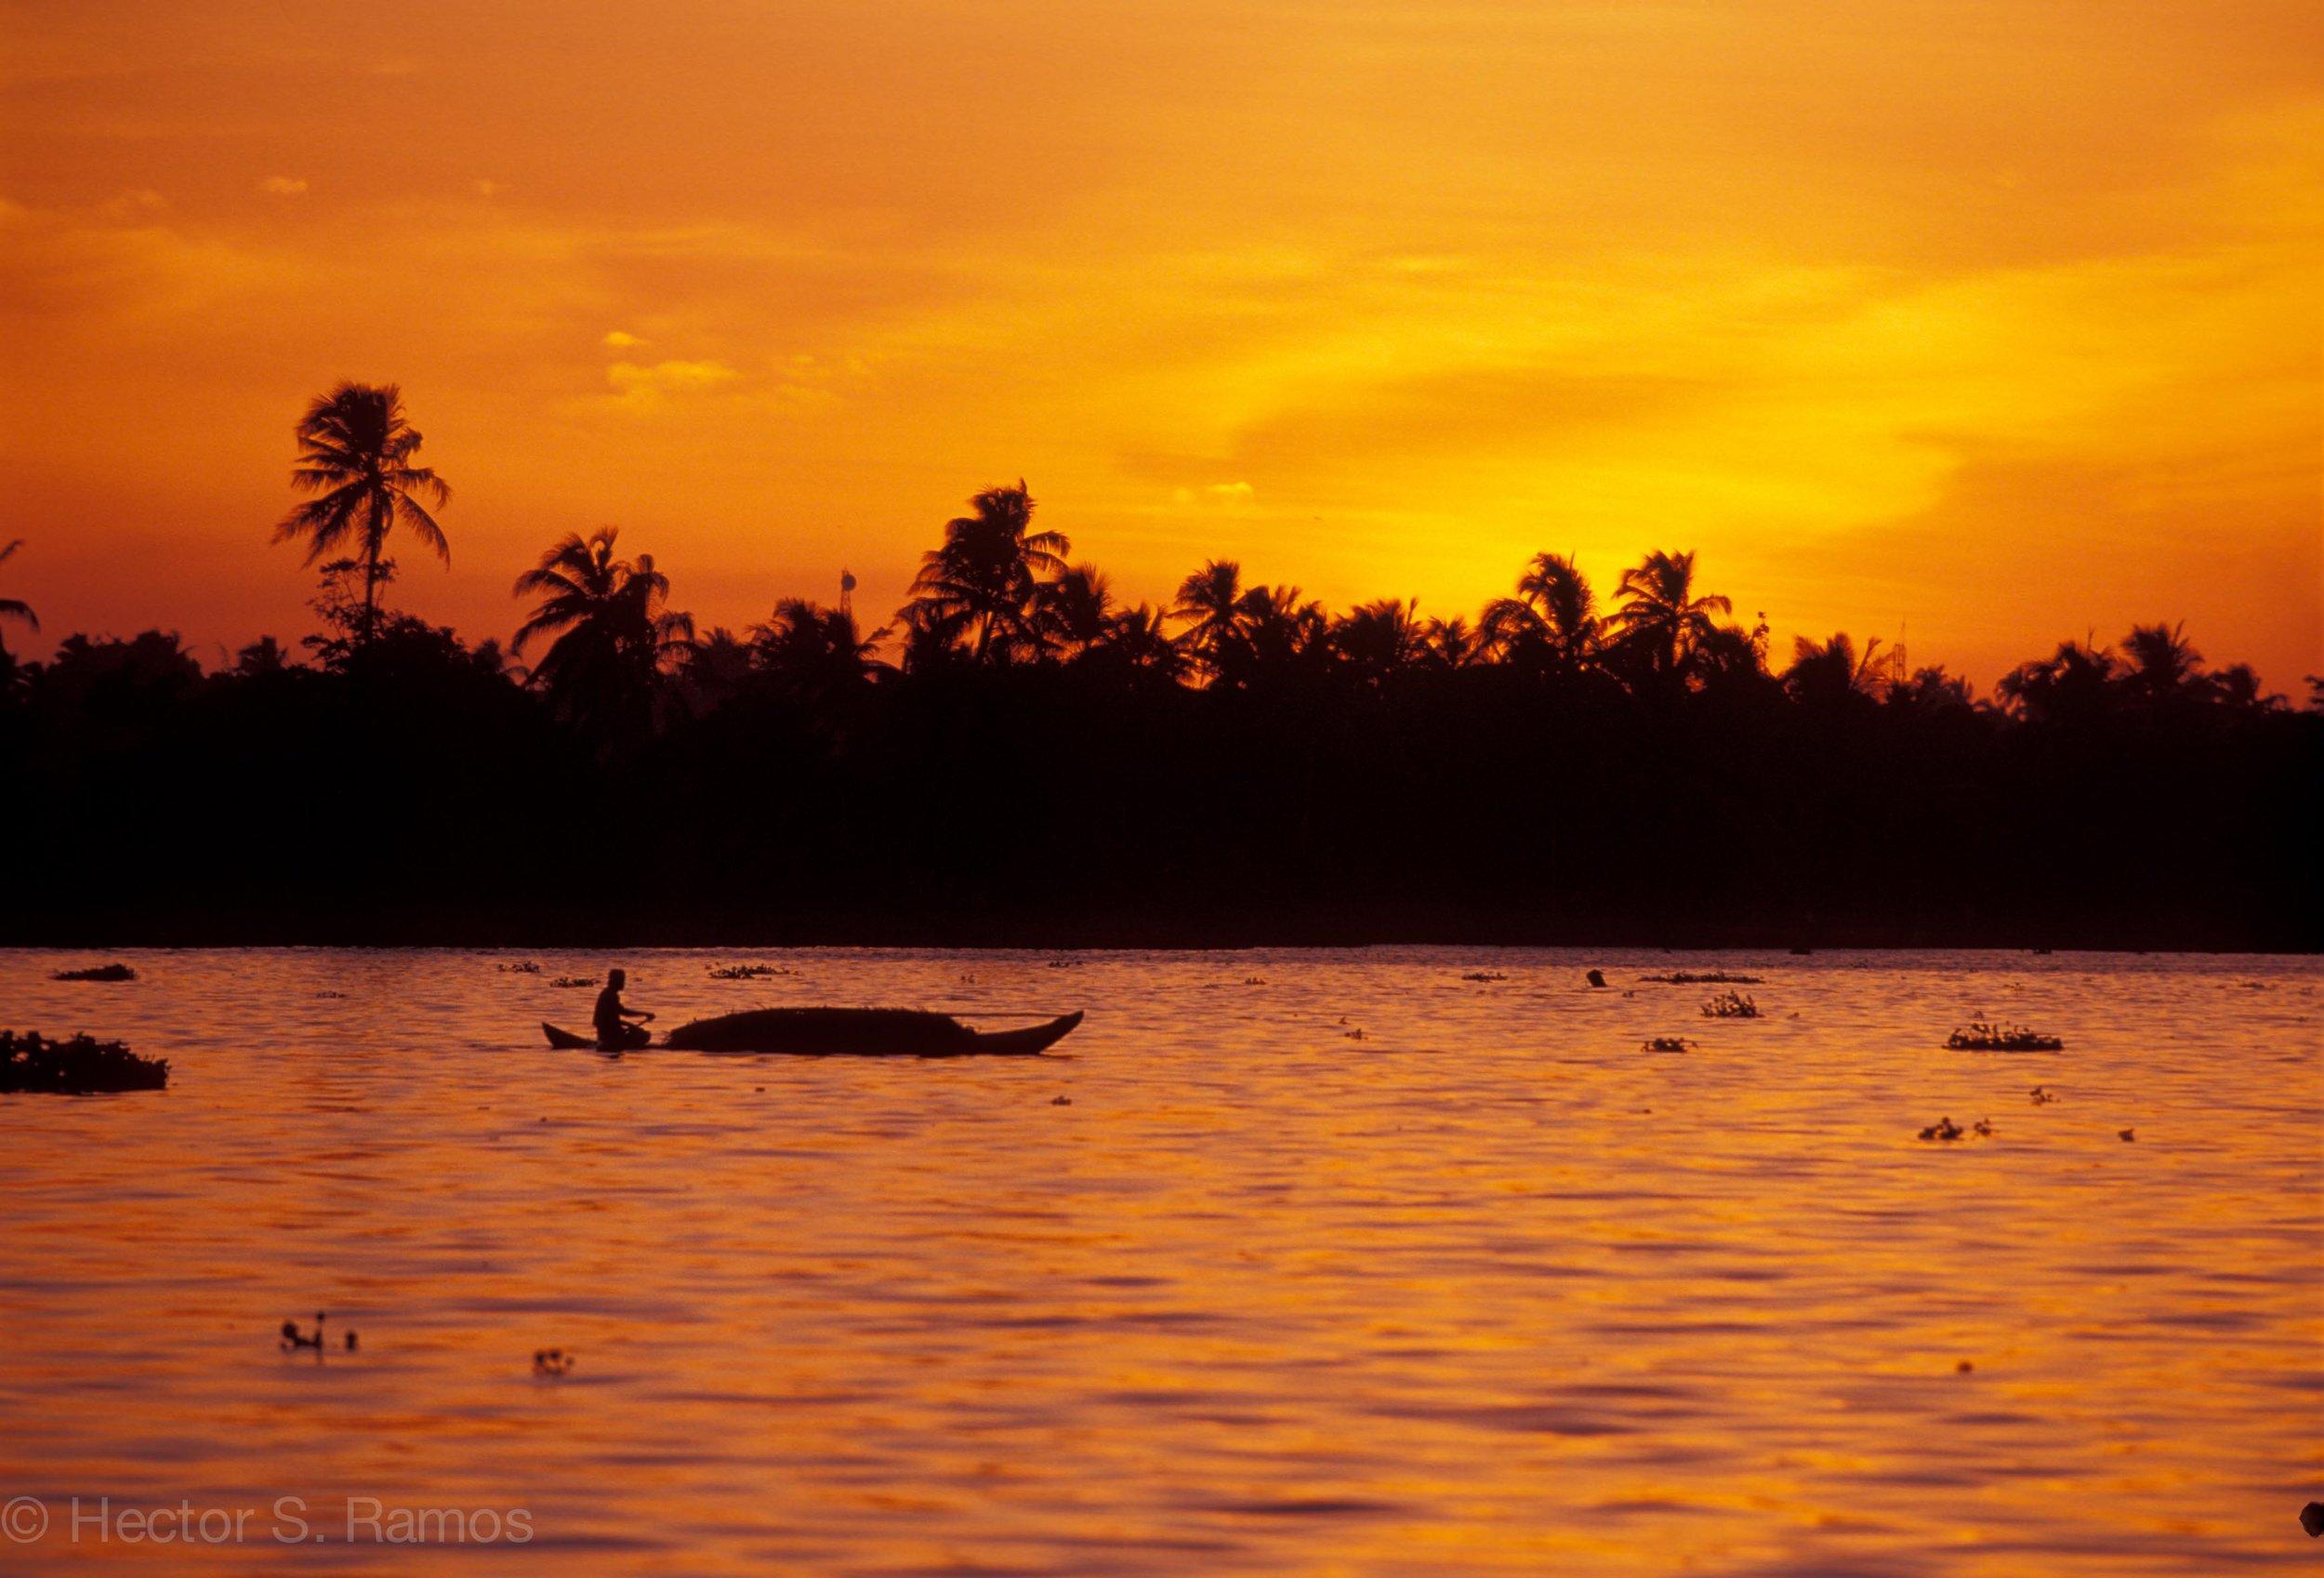 Day's end. Vembanad Lake, Kerala. Photo: Nikon F5, AFD 80-200mm f2.8, Provia 100.